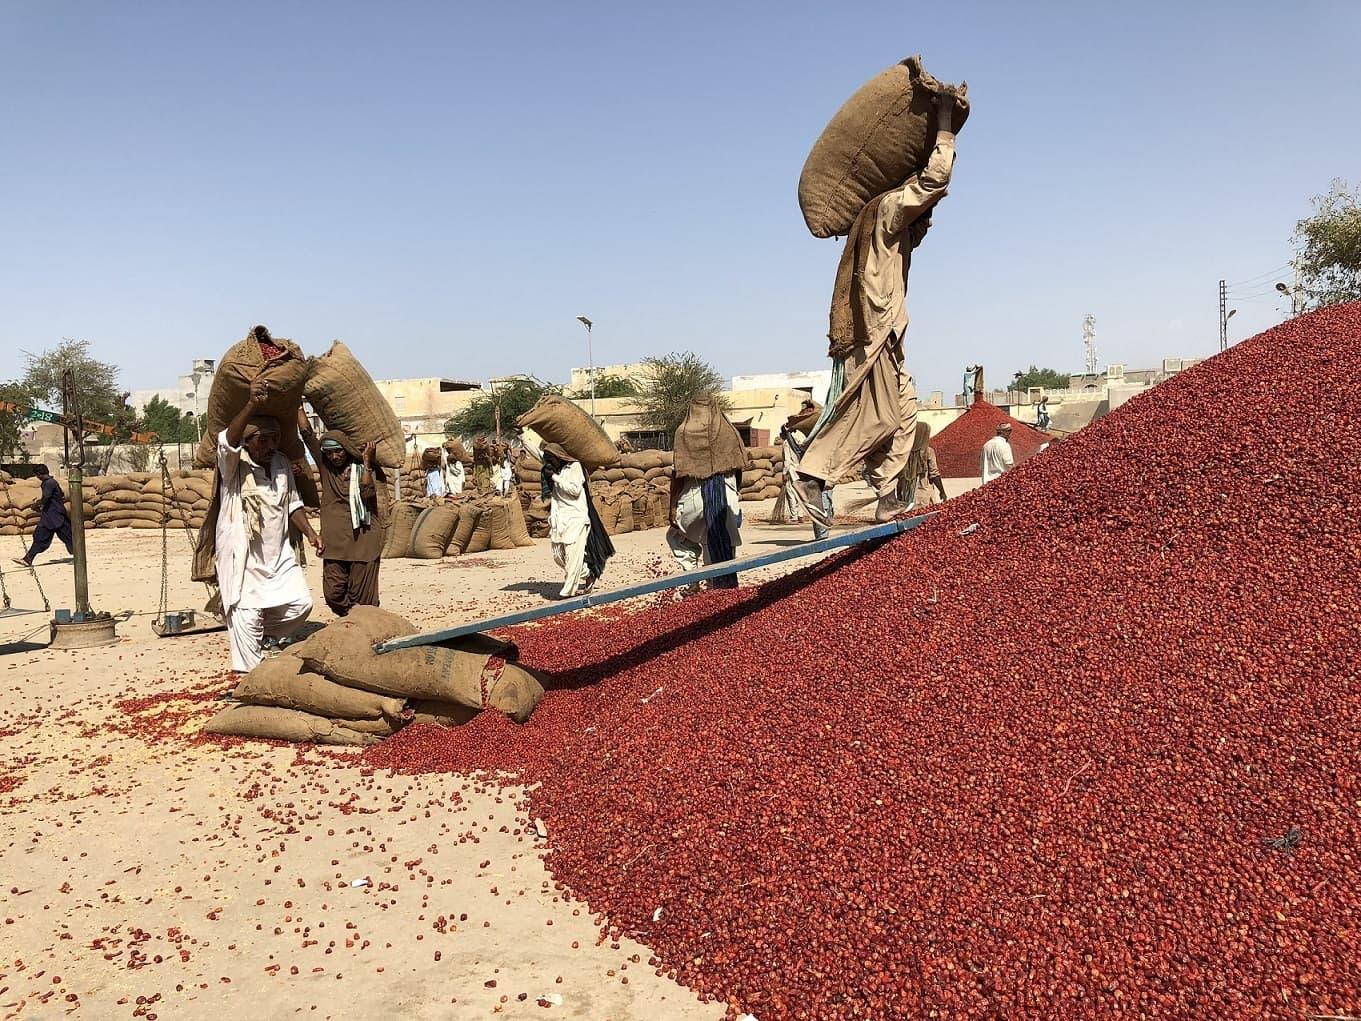 Labourers gather up red chillies on Kamal Khan Noonwani's land (Image by Zofeen T. Ebrahim)